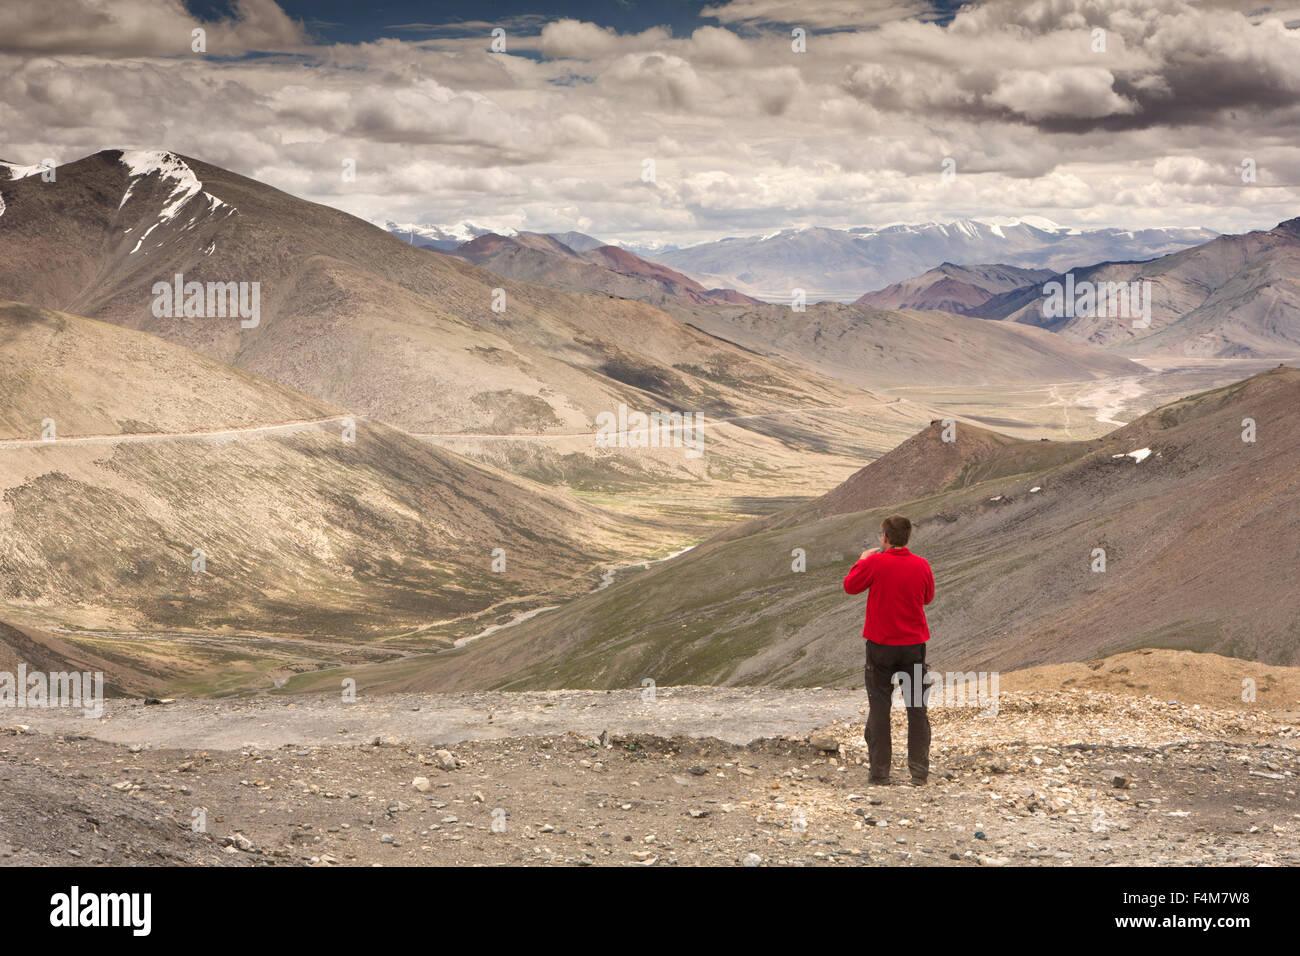 India, Jammu & Kashmir, Ladakh, Taglang La pass top, Indian tourist at summit photographing mountains - Stock Image